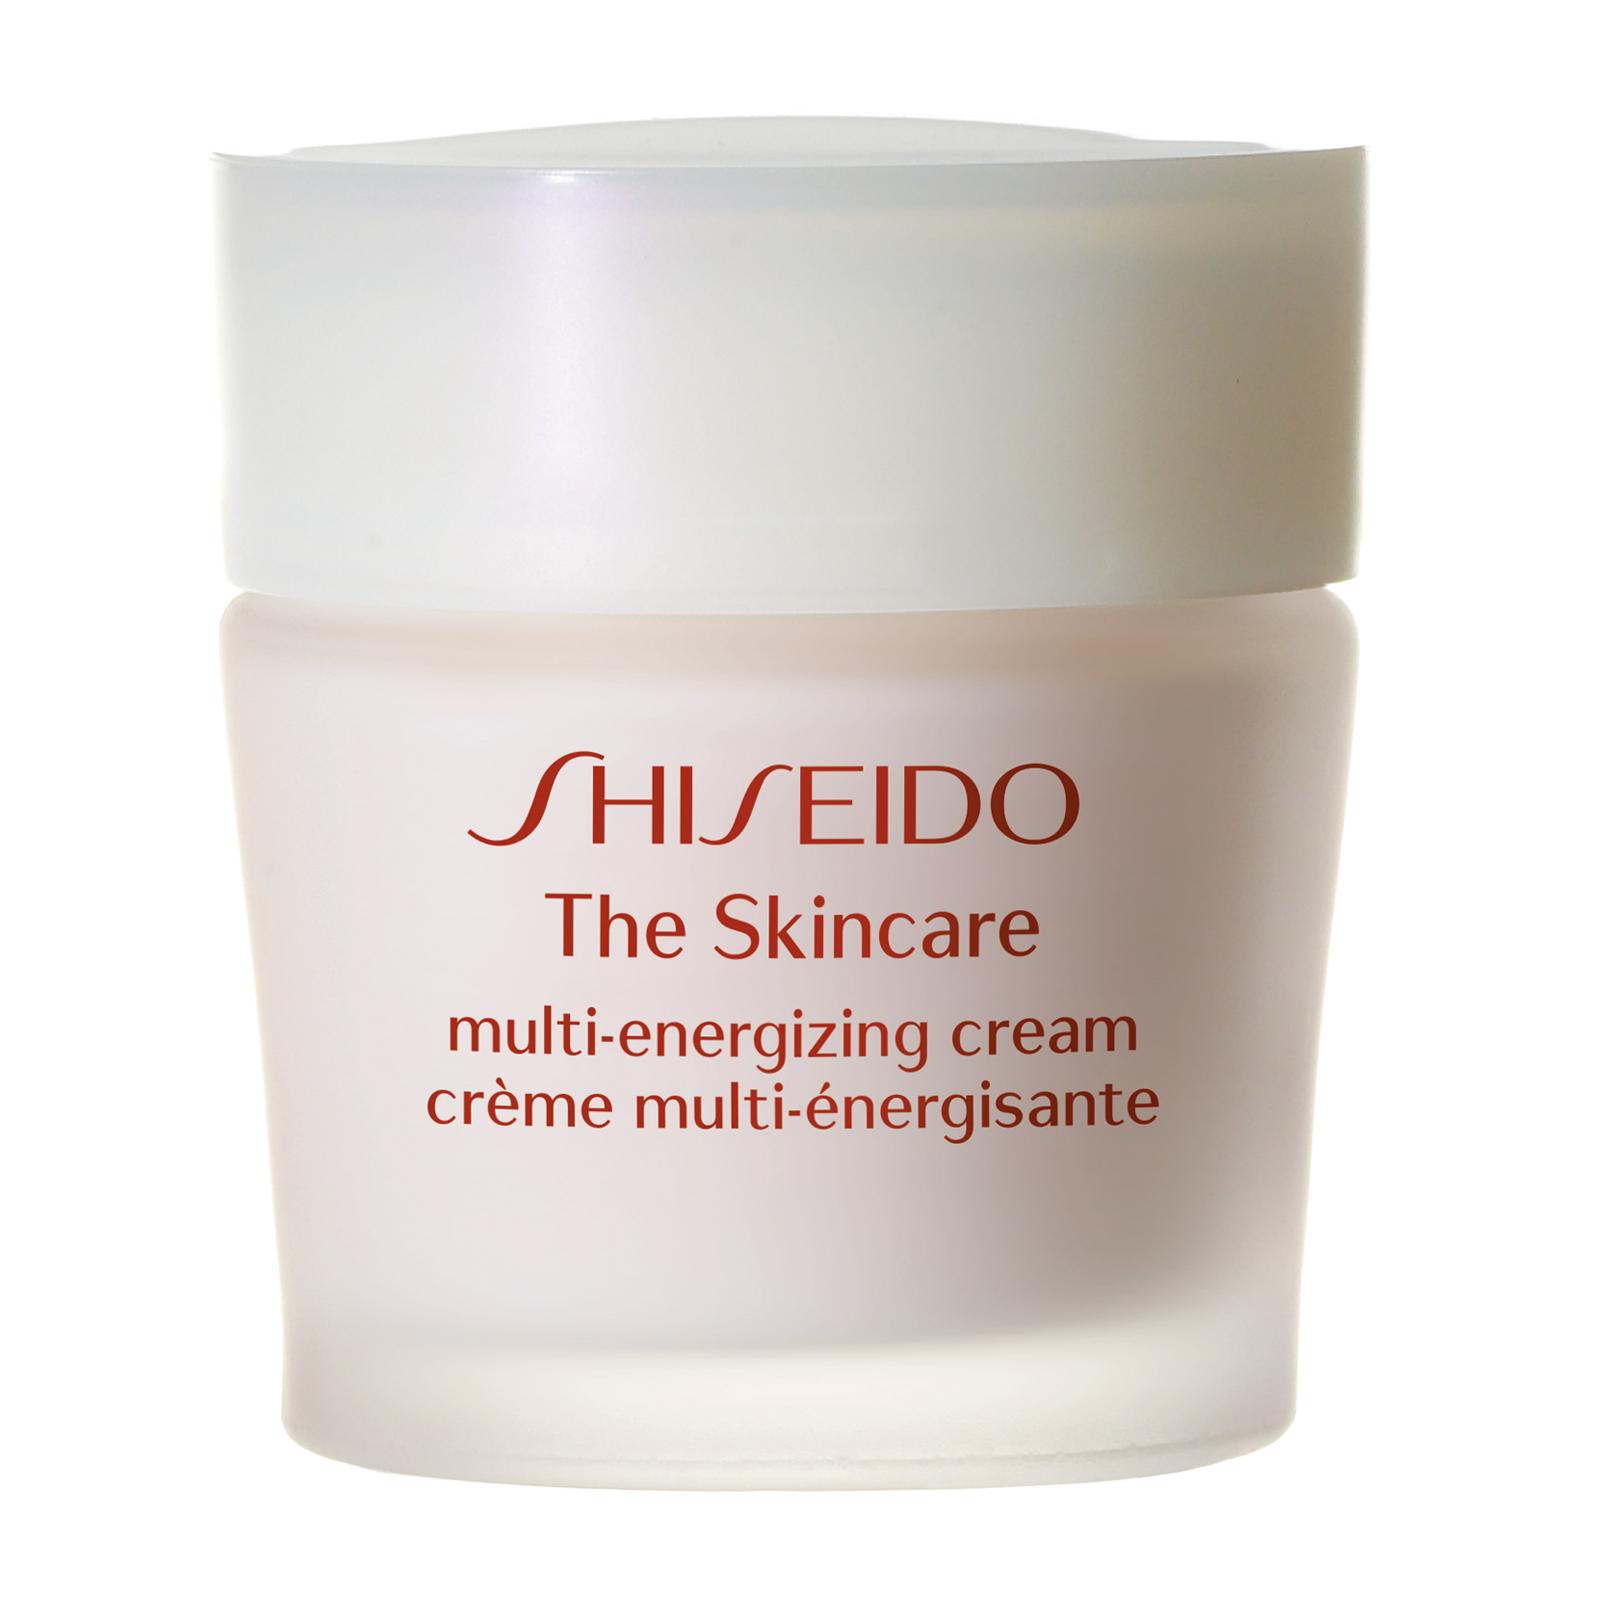 Shiseido Skincare Multi-Energizing Cream